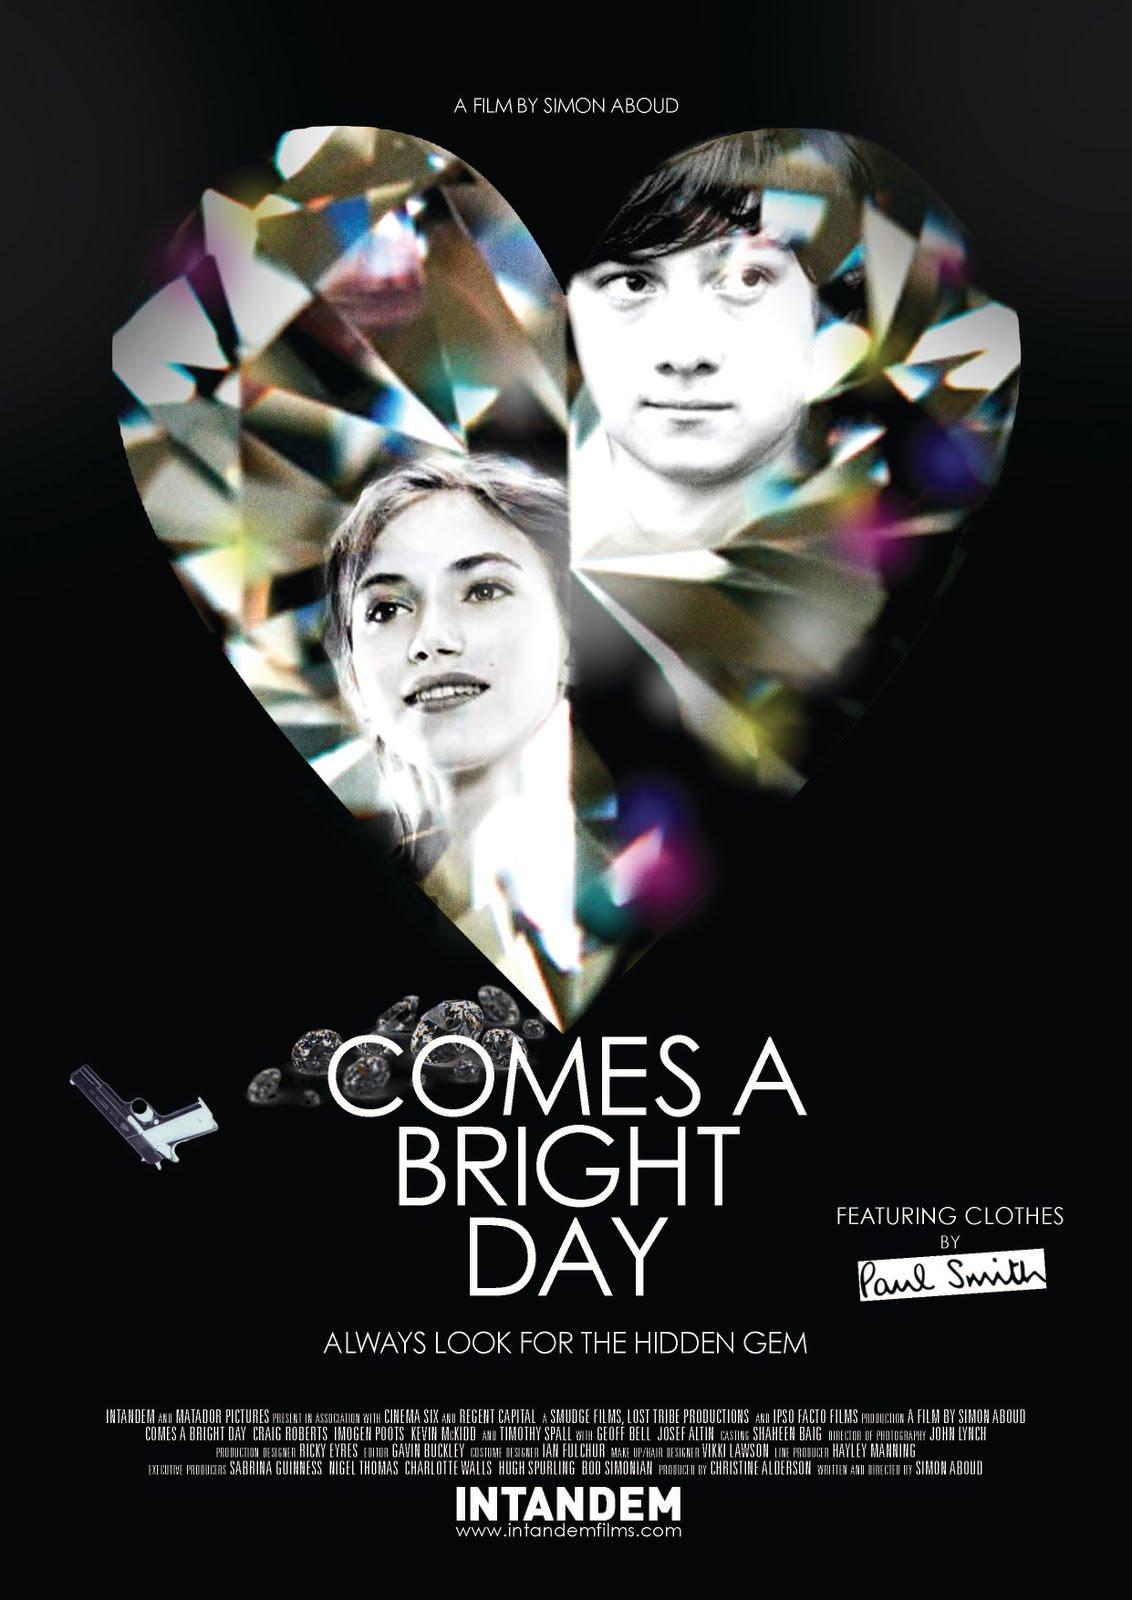 affiche du film Comes a Bright Day